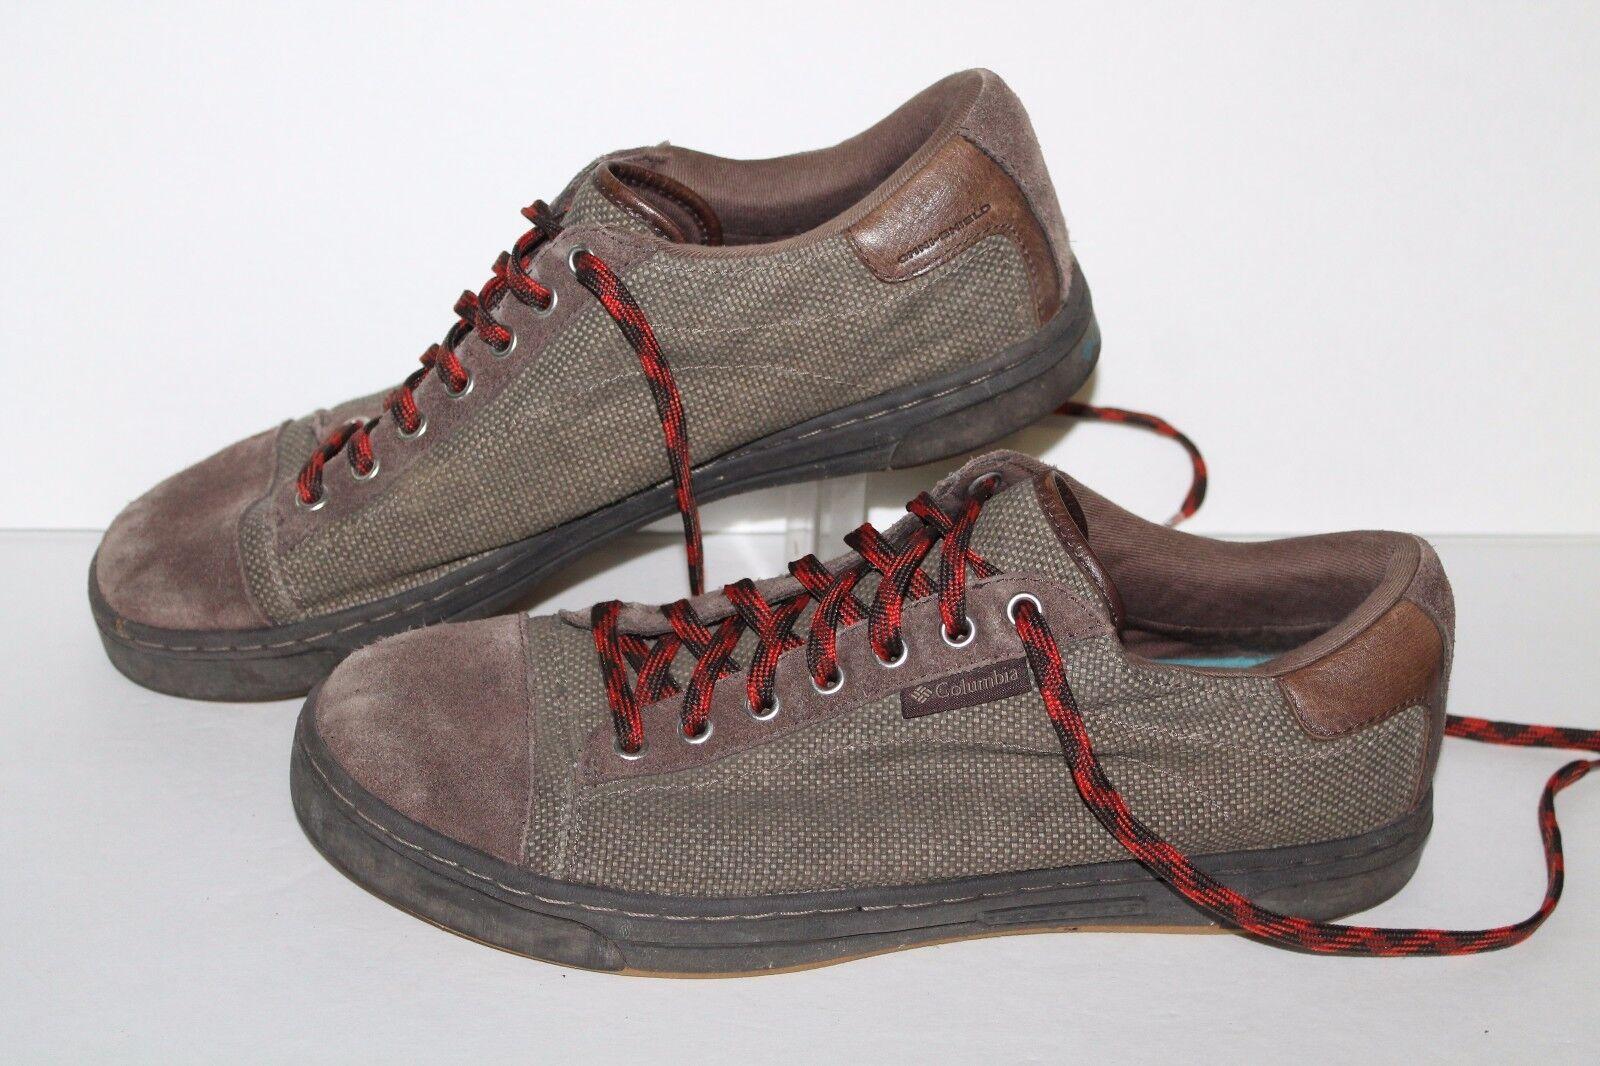 Columbia Norton Casual Shoe, Tobacco Brown, Mens US Size 13